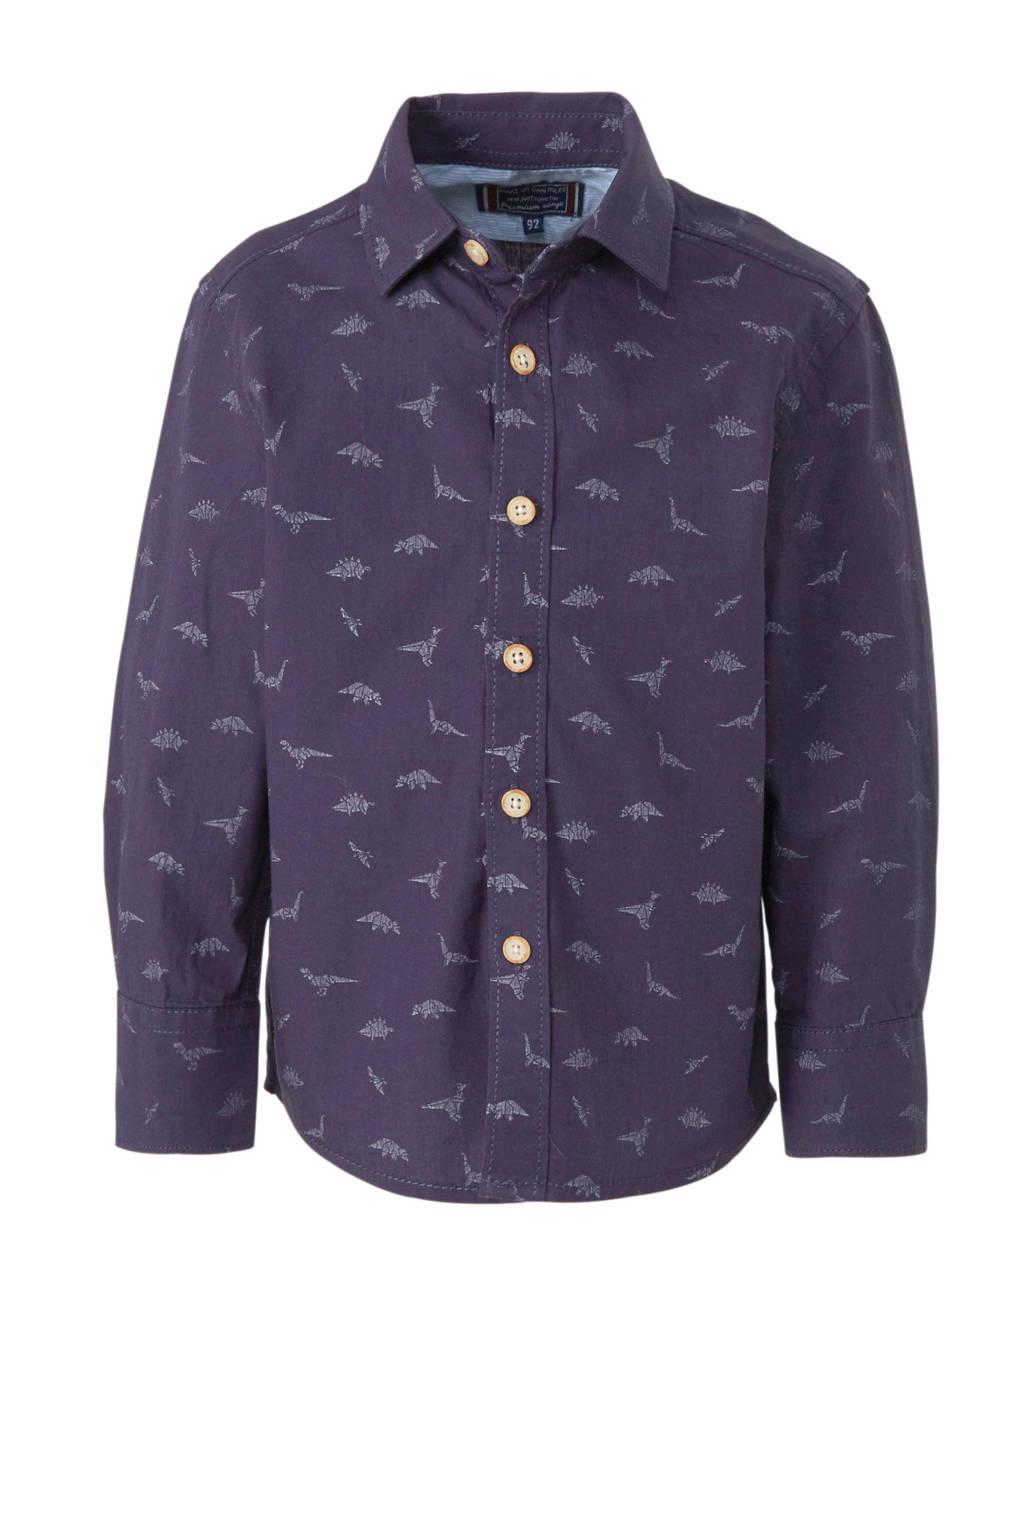 C&A Palomino overhemd met all over print blauw, Donkerblauw/wit